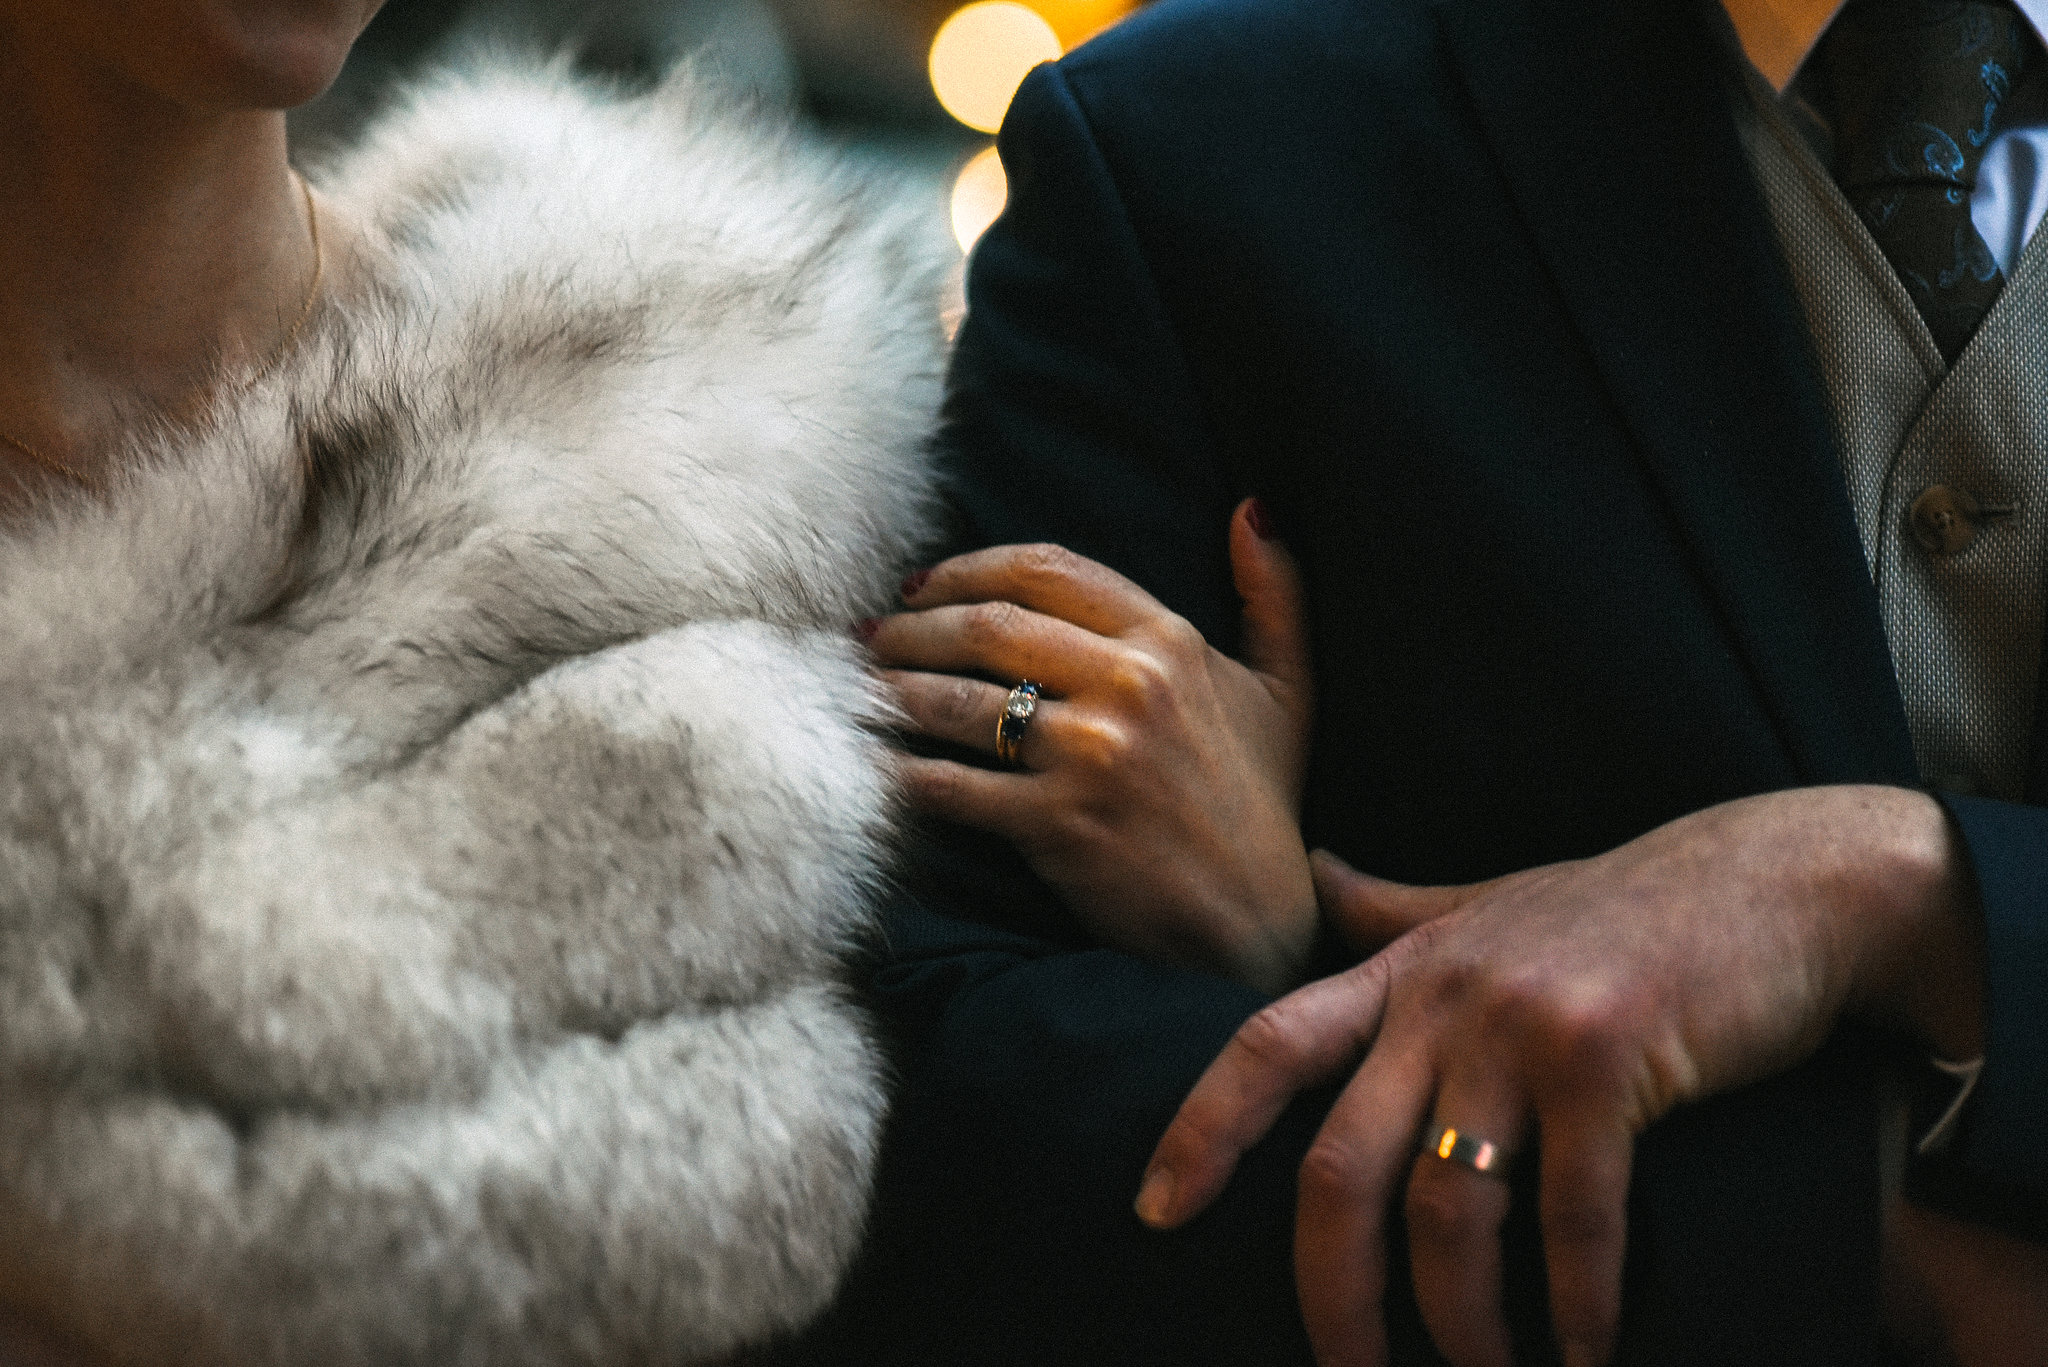 Alexandria, DC, Romantic, Vintage, Rustic, Bride and Groom, Wedding Detail, Wedding Rings, ForrellC. Jewelry, Fur Wrap